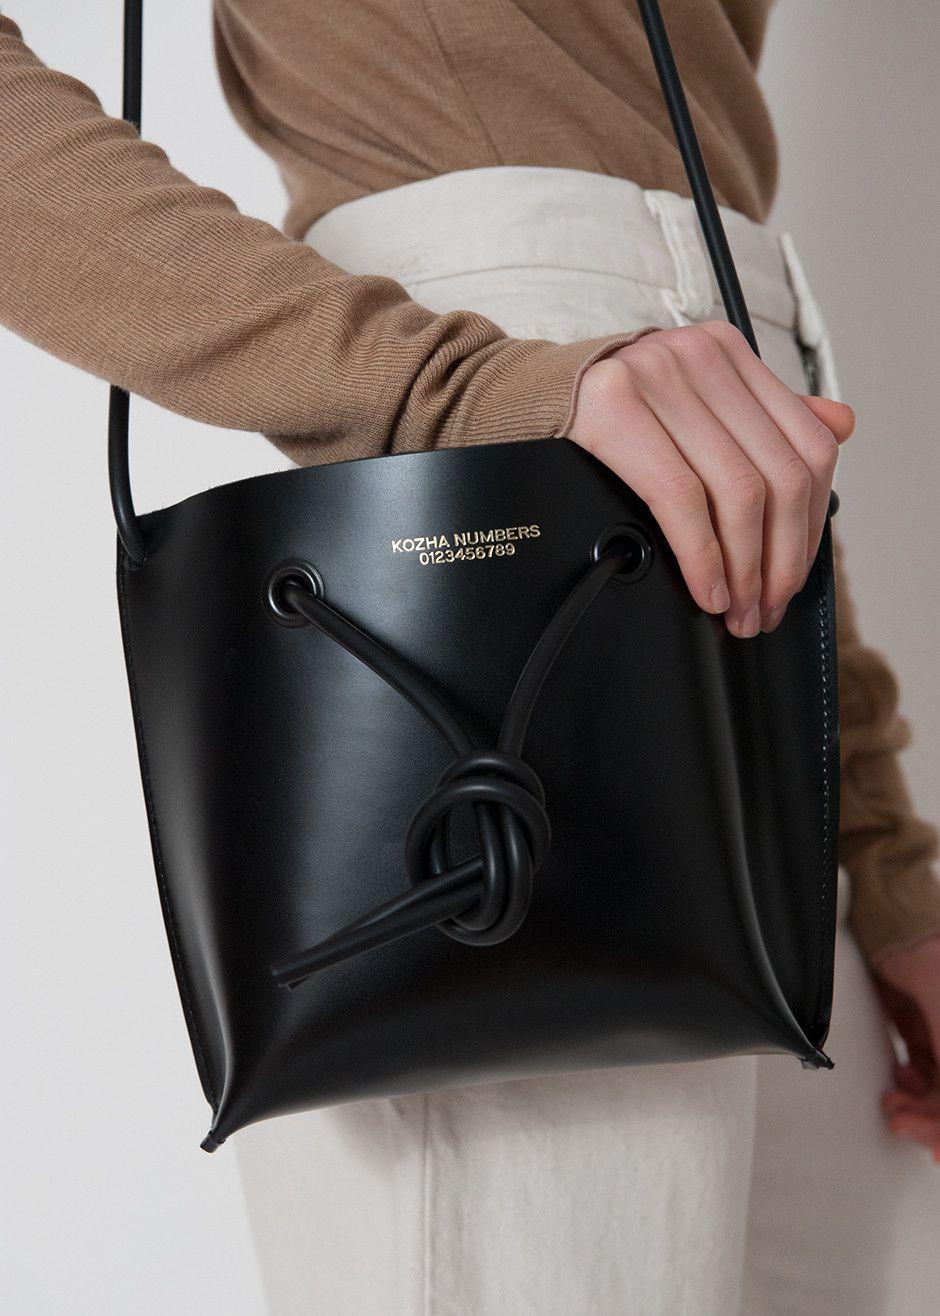 Model holding Kozha Numbers Ket Bag